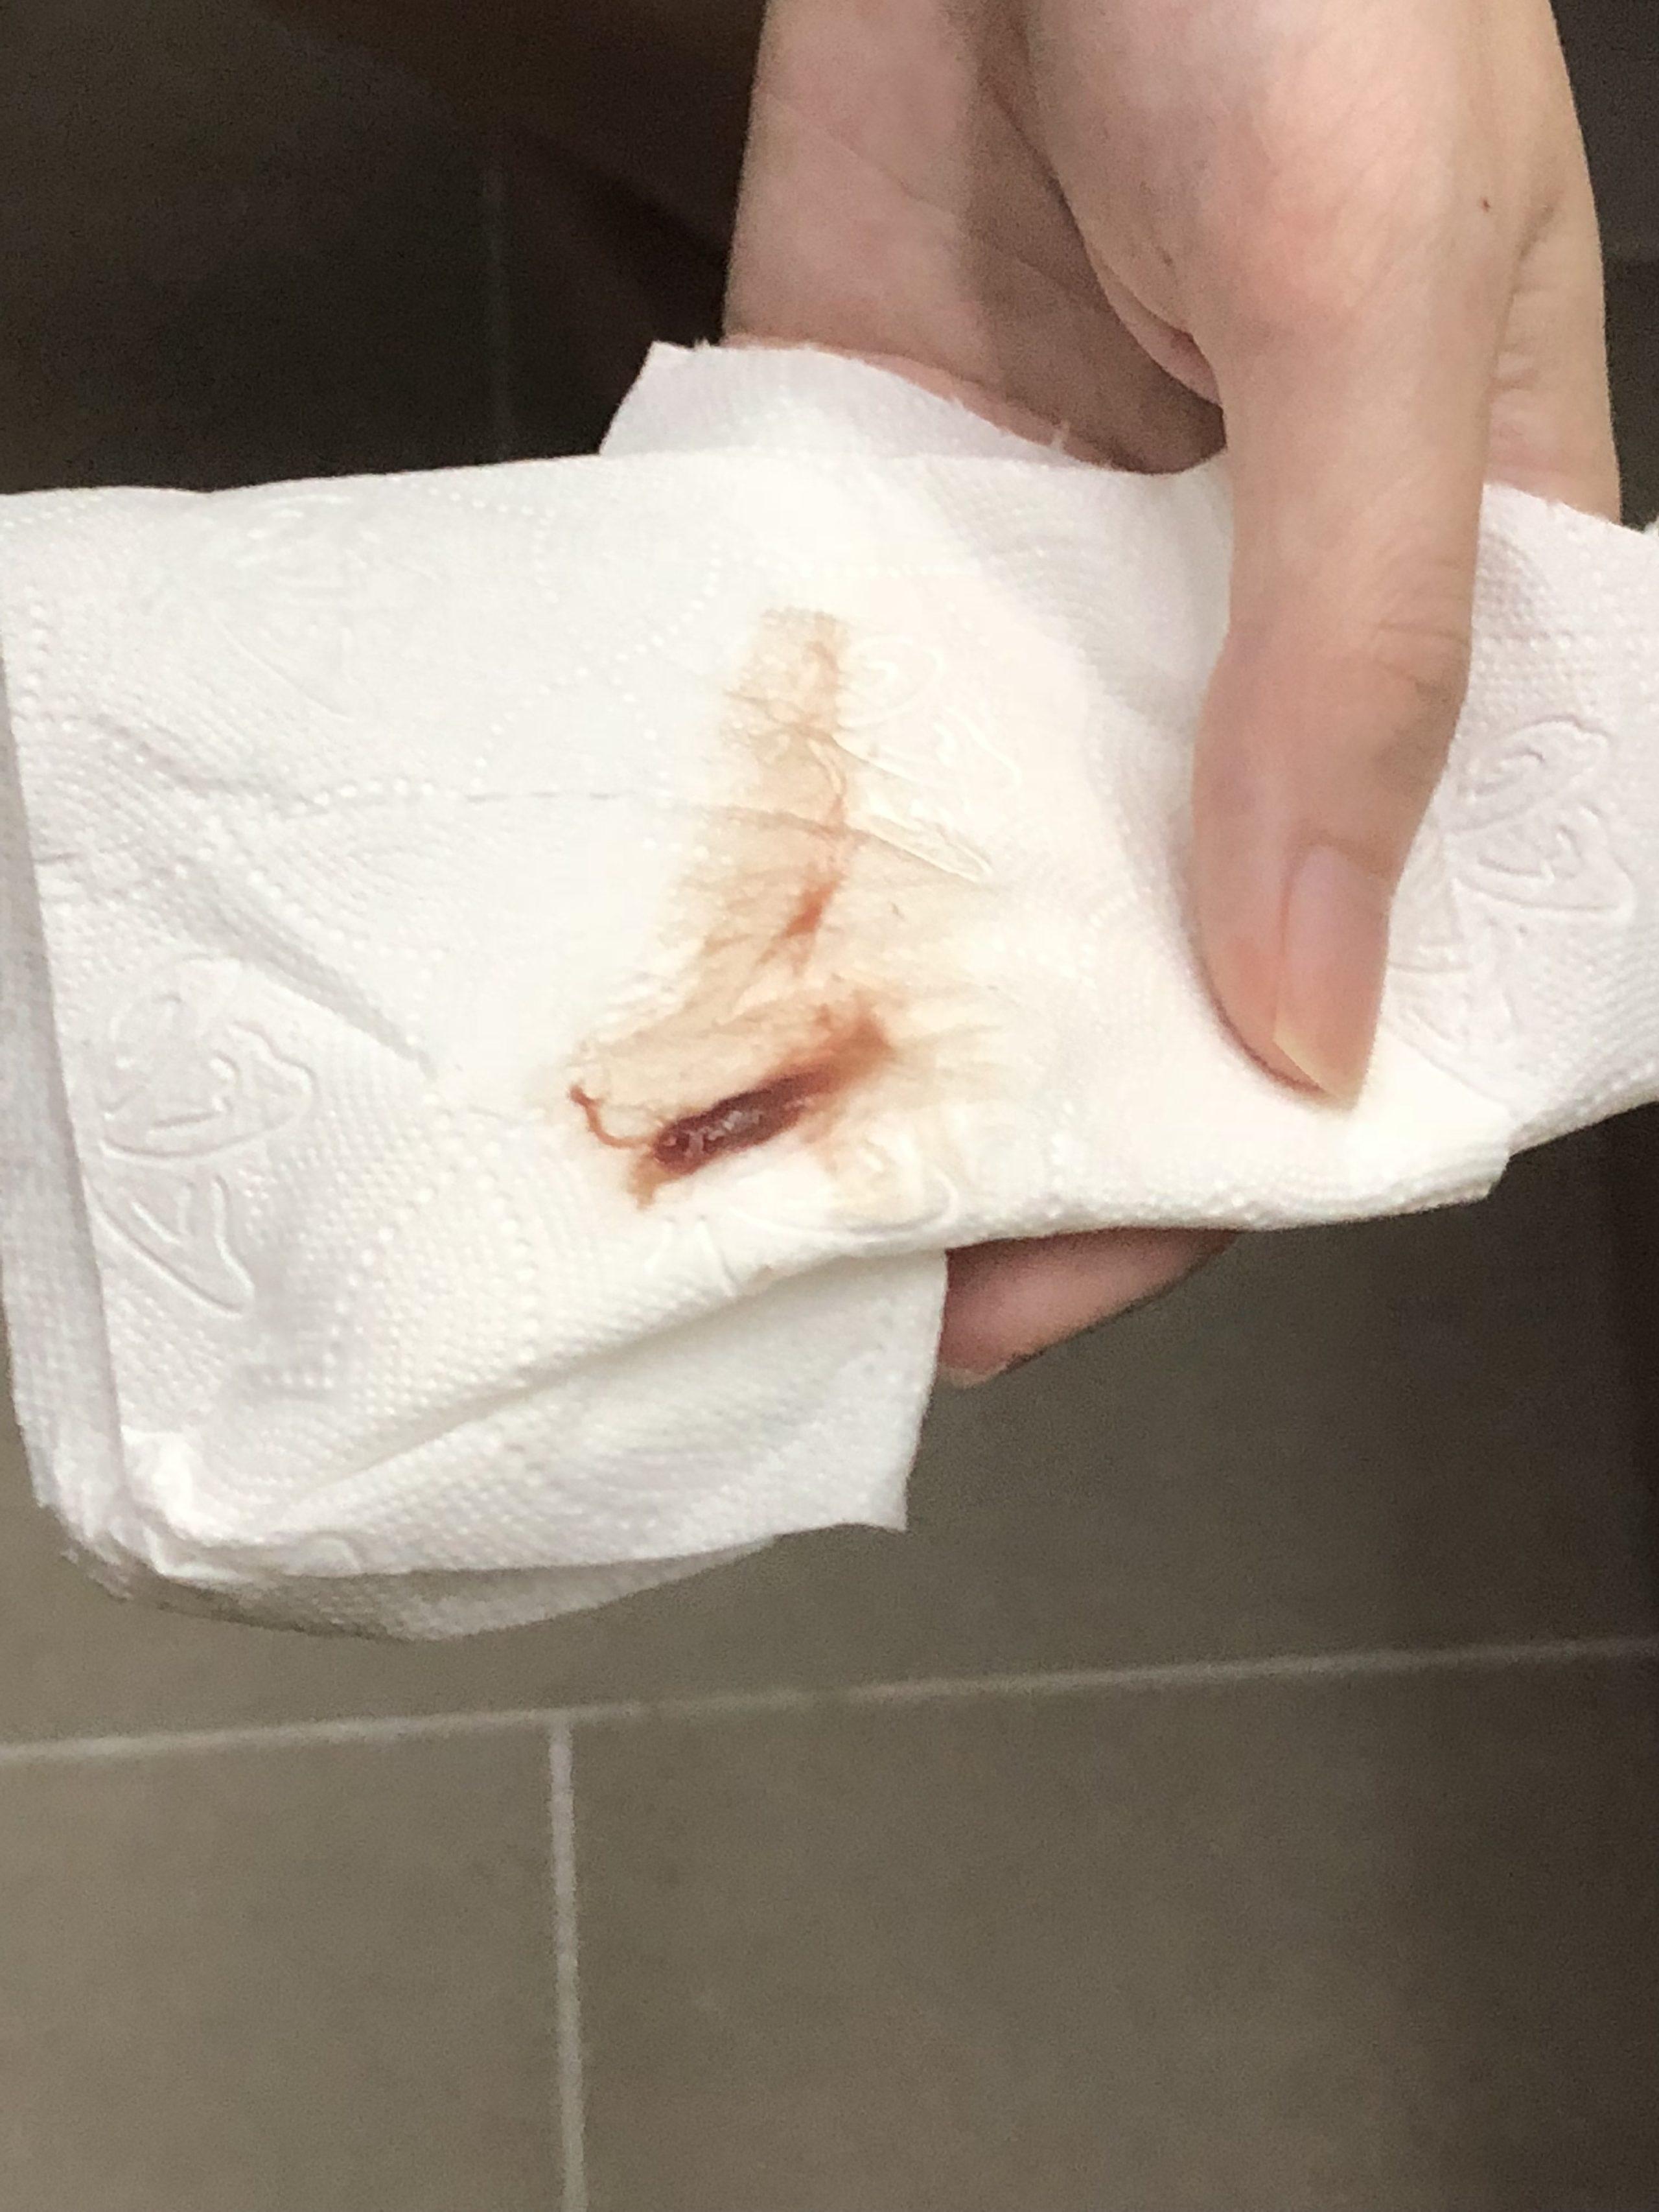 Late Implantation Bleeding